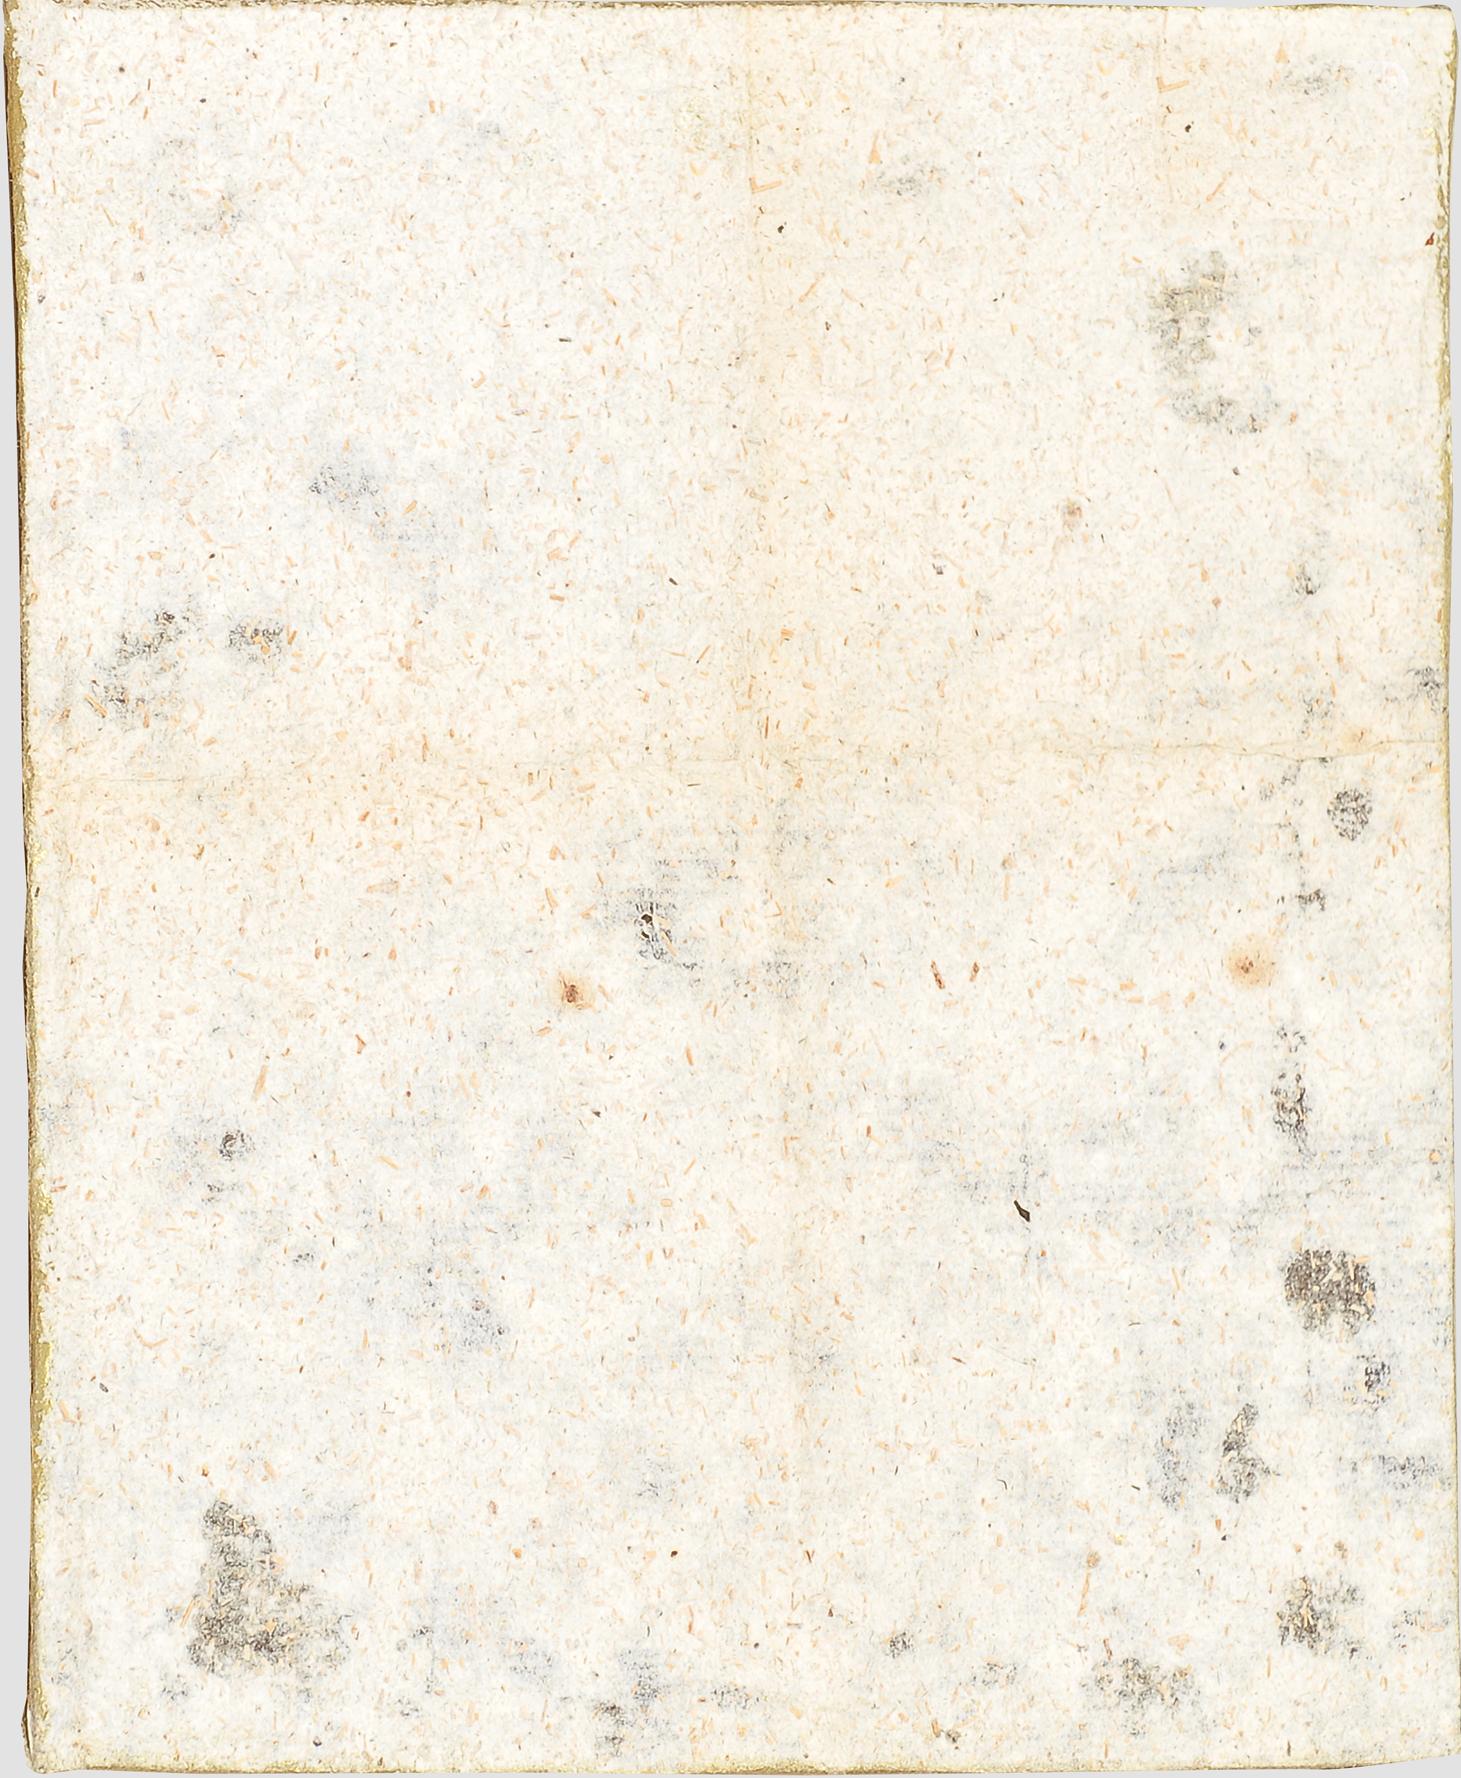 König von Neapel, Gemälde, Empire um 1800 - Image 3 of 3